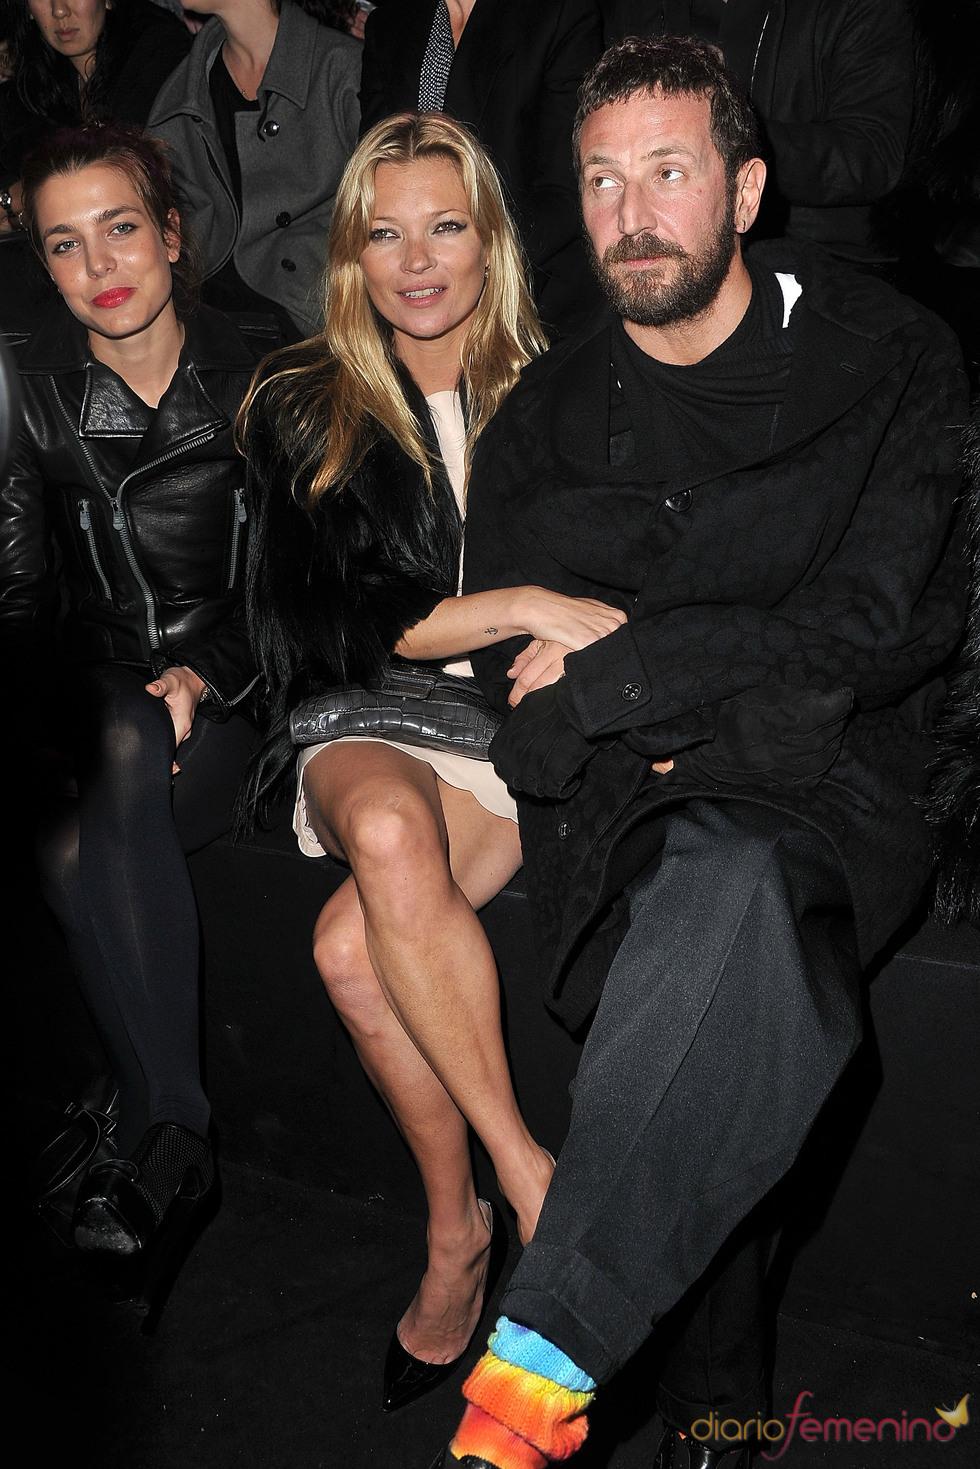 Carlota Casiraghi y Kate Moss juntas en el desfile de Etam